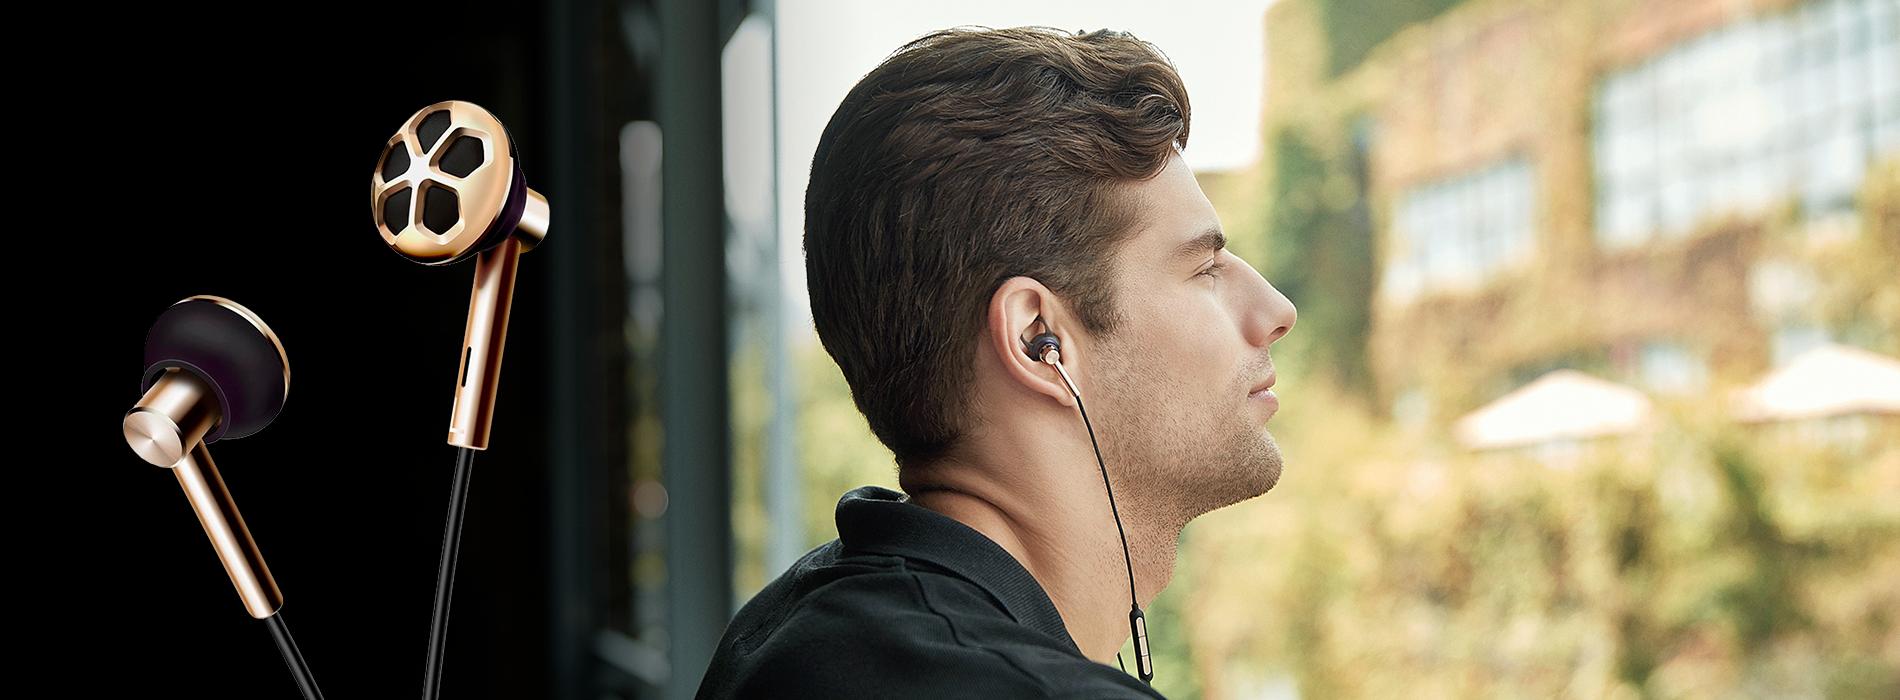 1MORE-Dual-Driver-EarPod